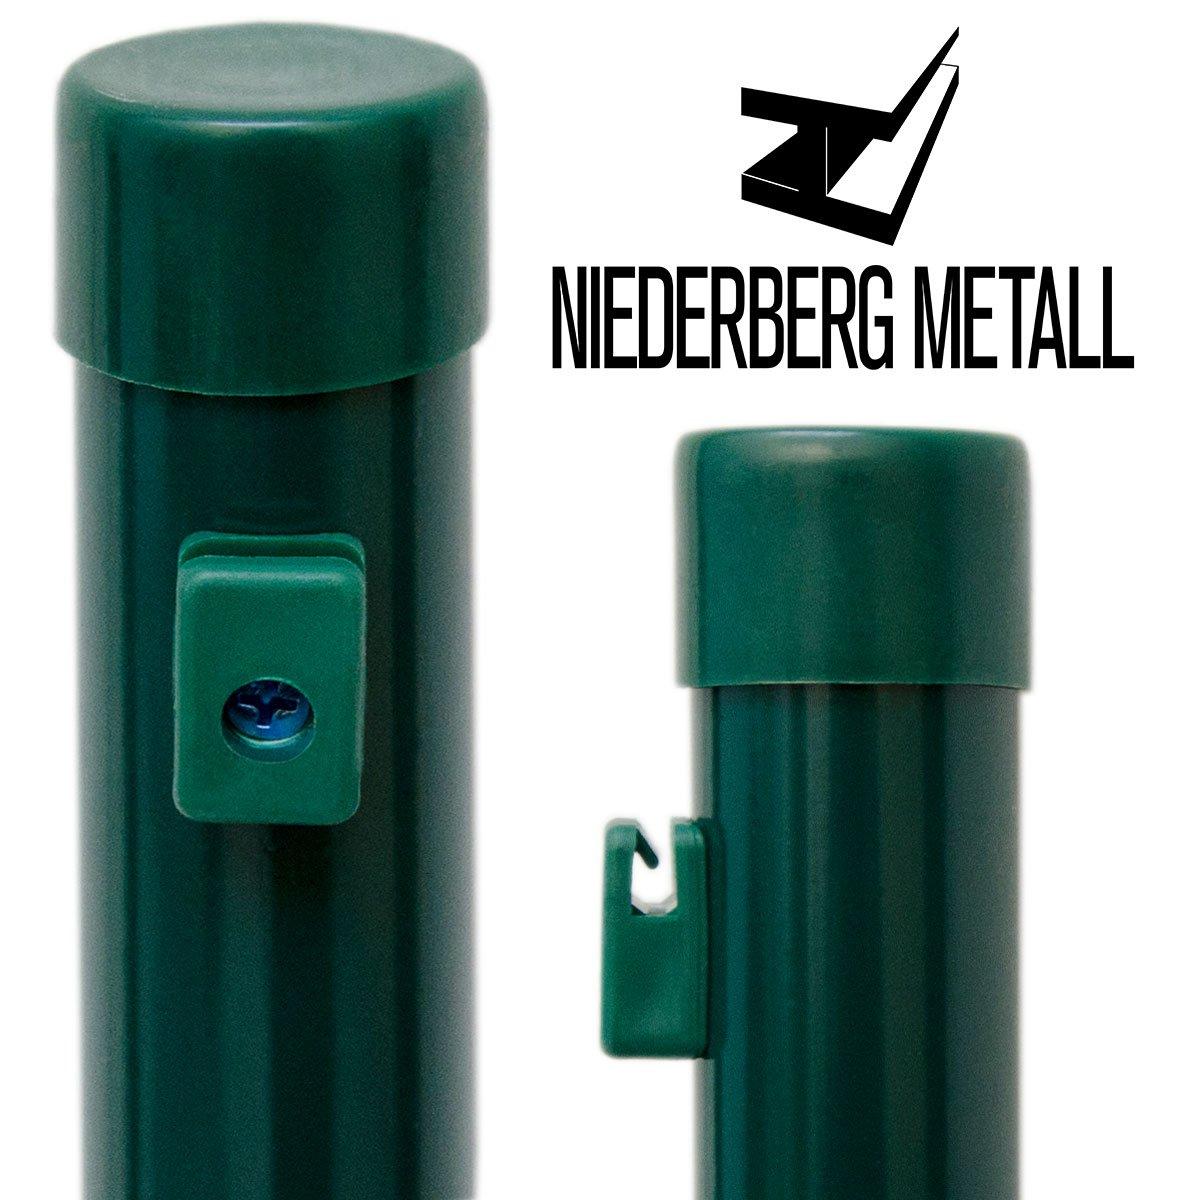 NIEDERBERG METALL Zaunpfosten 150 cm Zaunpfahl ˜ 34 mm Metall